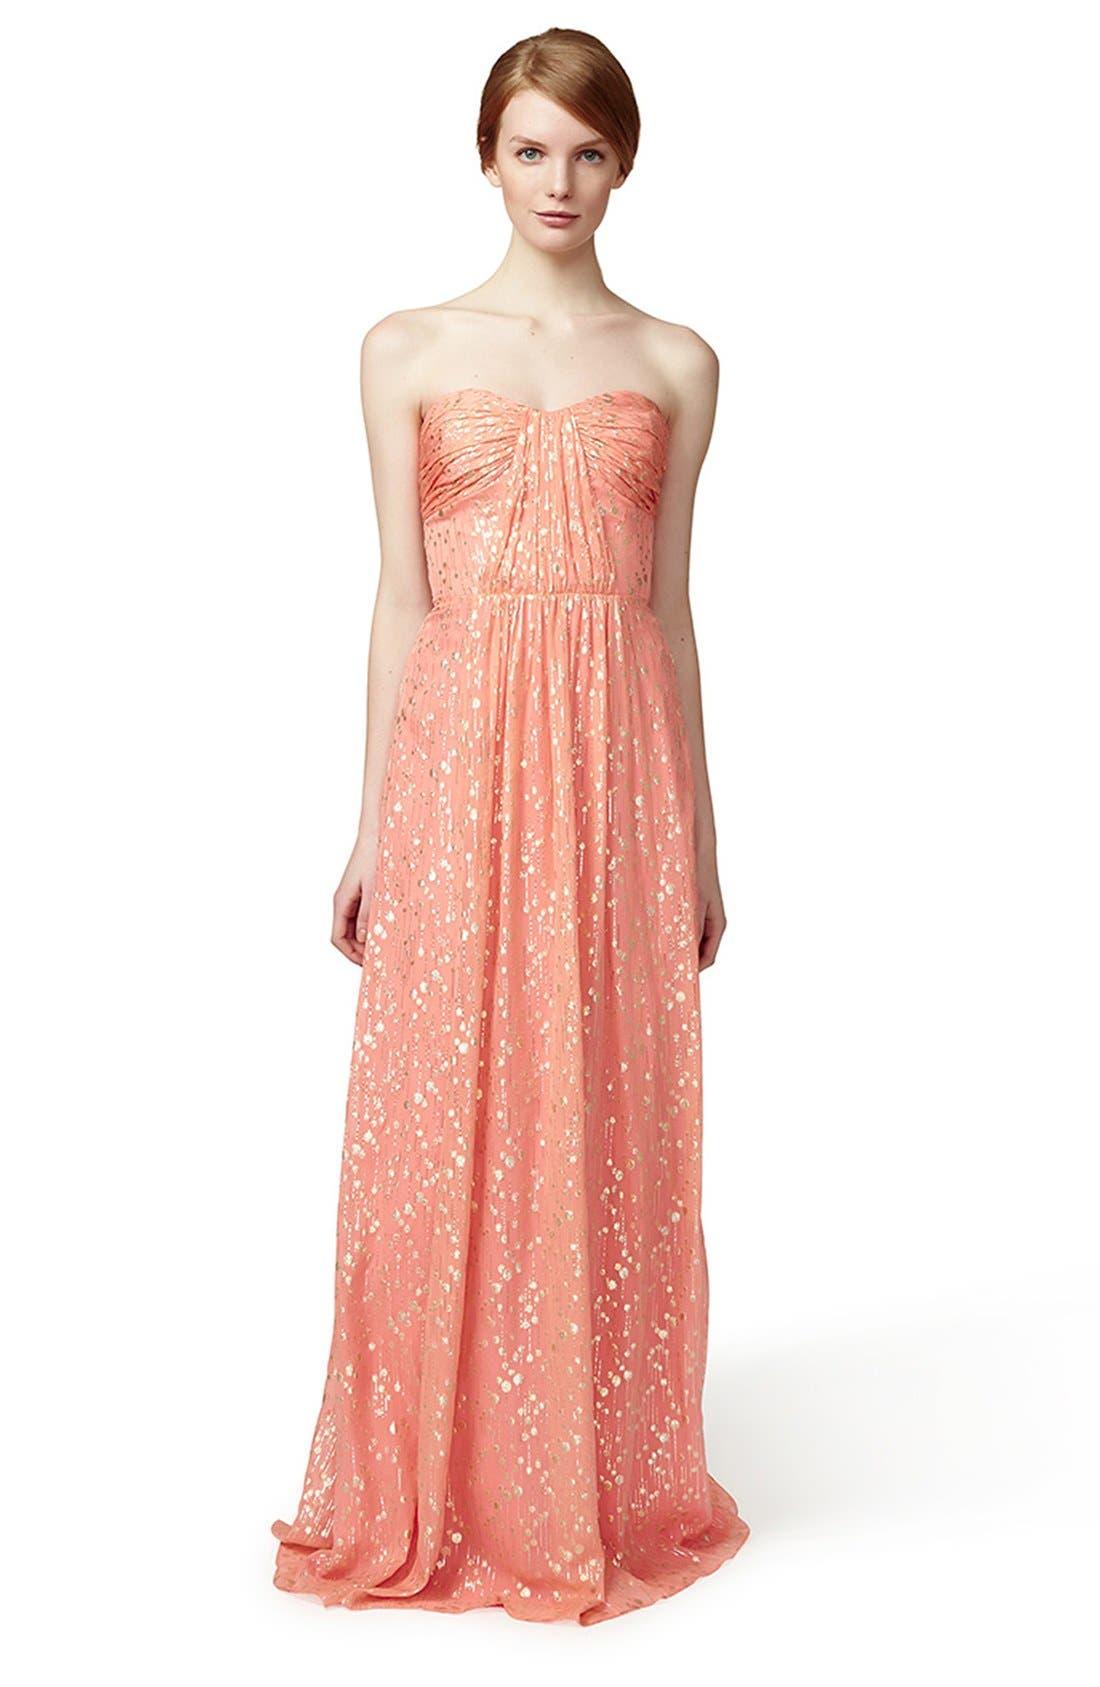 ERIN ERIN FETHERSTON, 'Monique' Foiled Silk Chiffon Gown, Alternate thumbnail 4, color, 950